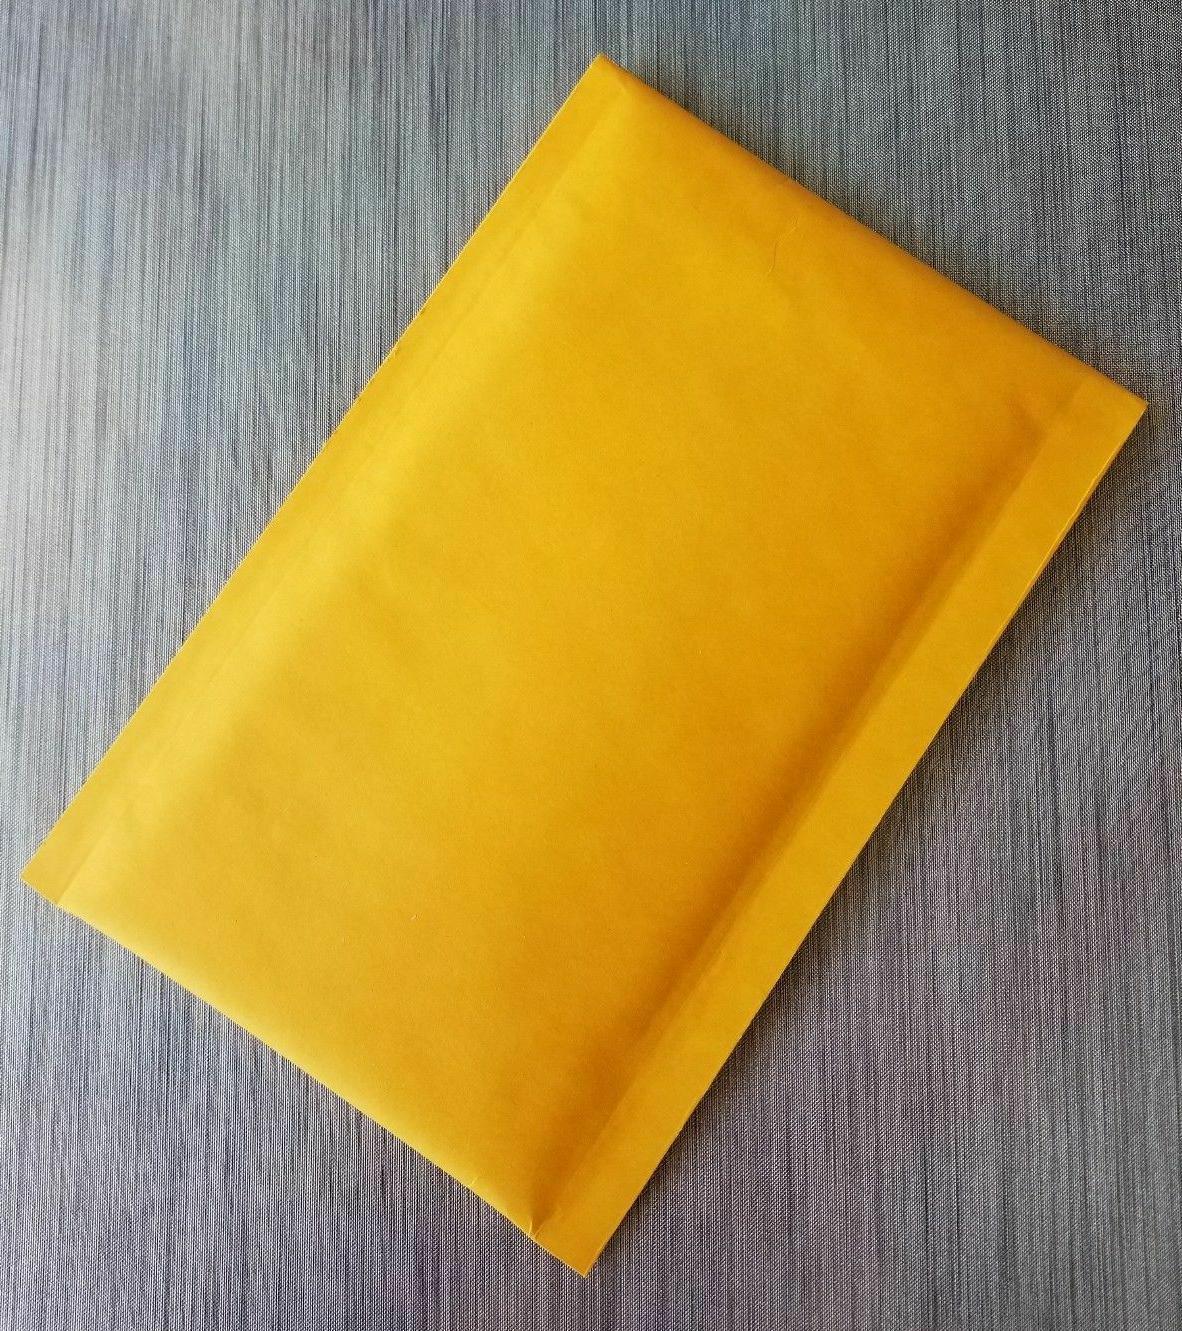 Pinapple EDP SAMPLE